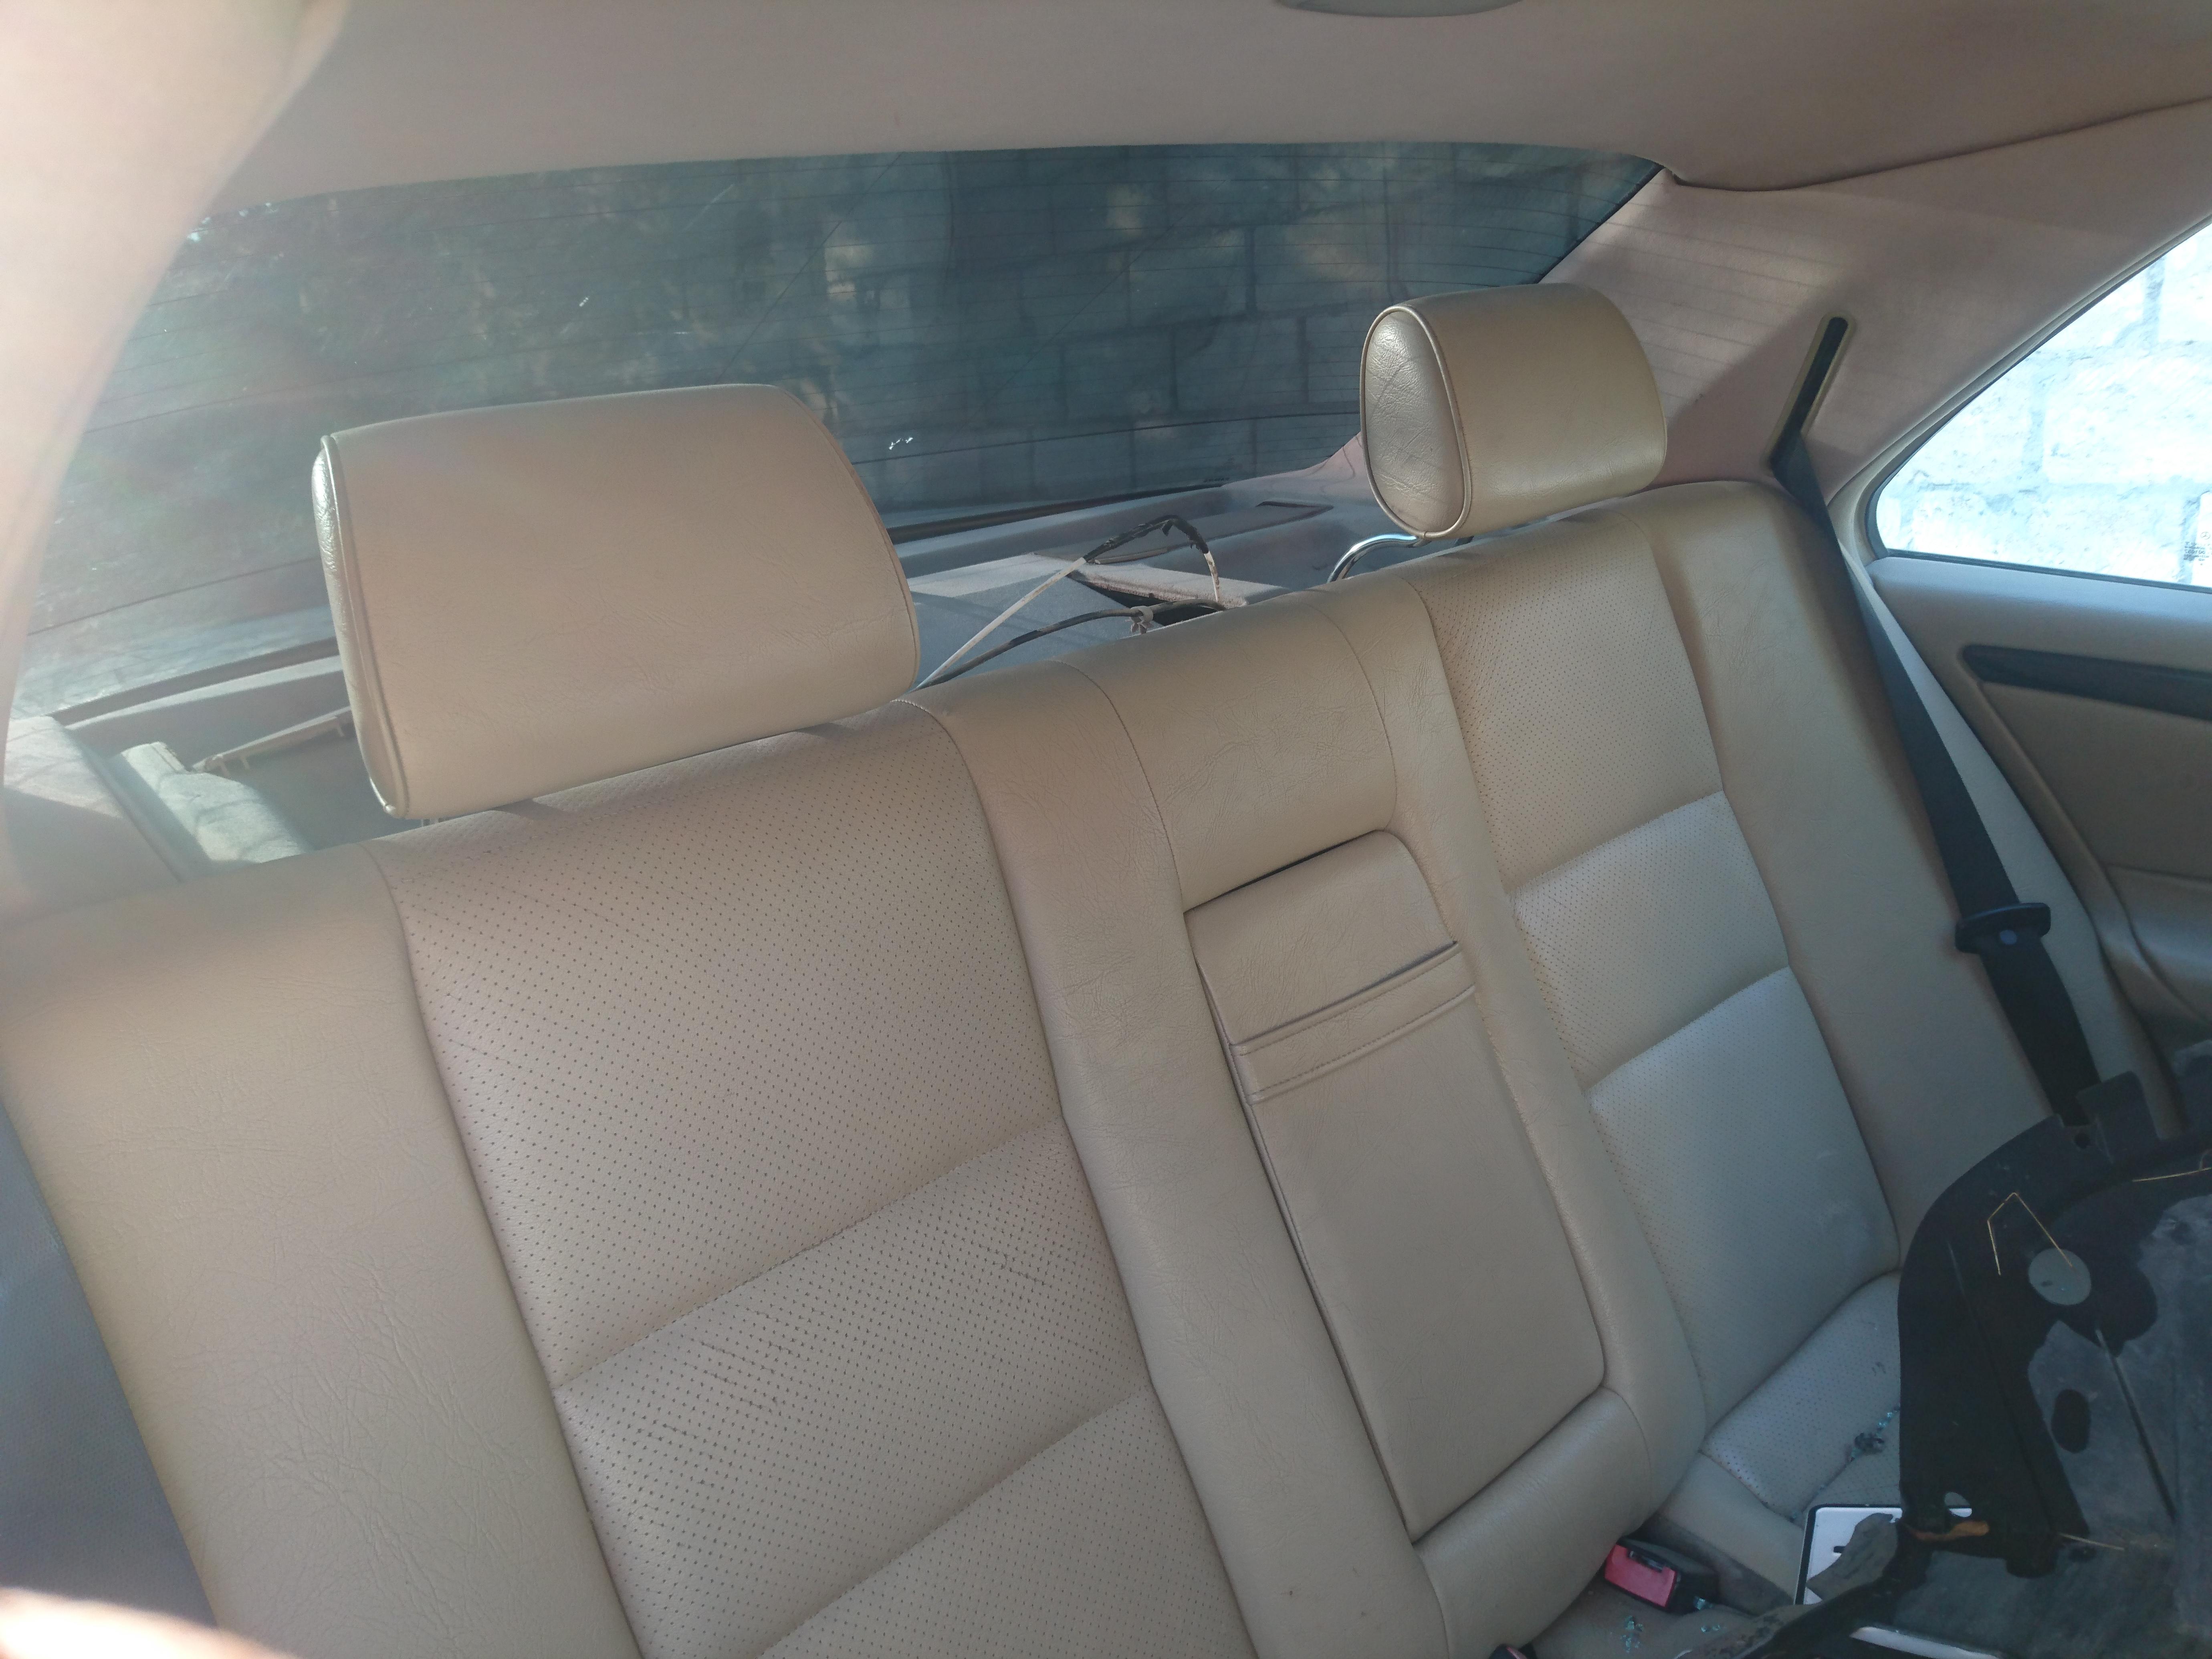 Mercedes-Benz C 230 2.3(lt) 2000 Second hand  $6600